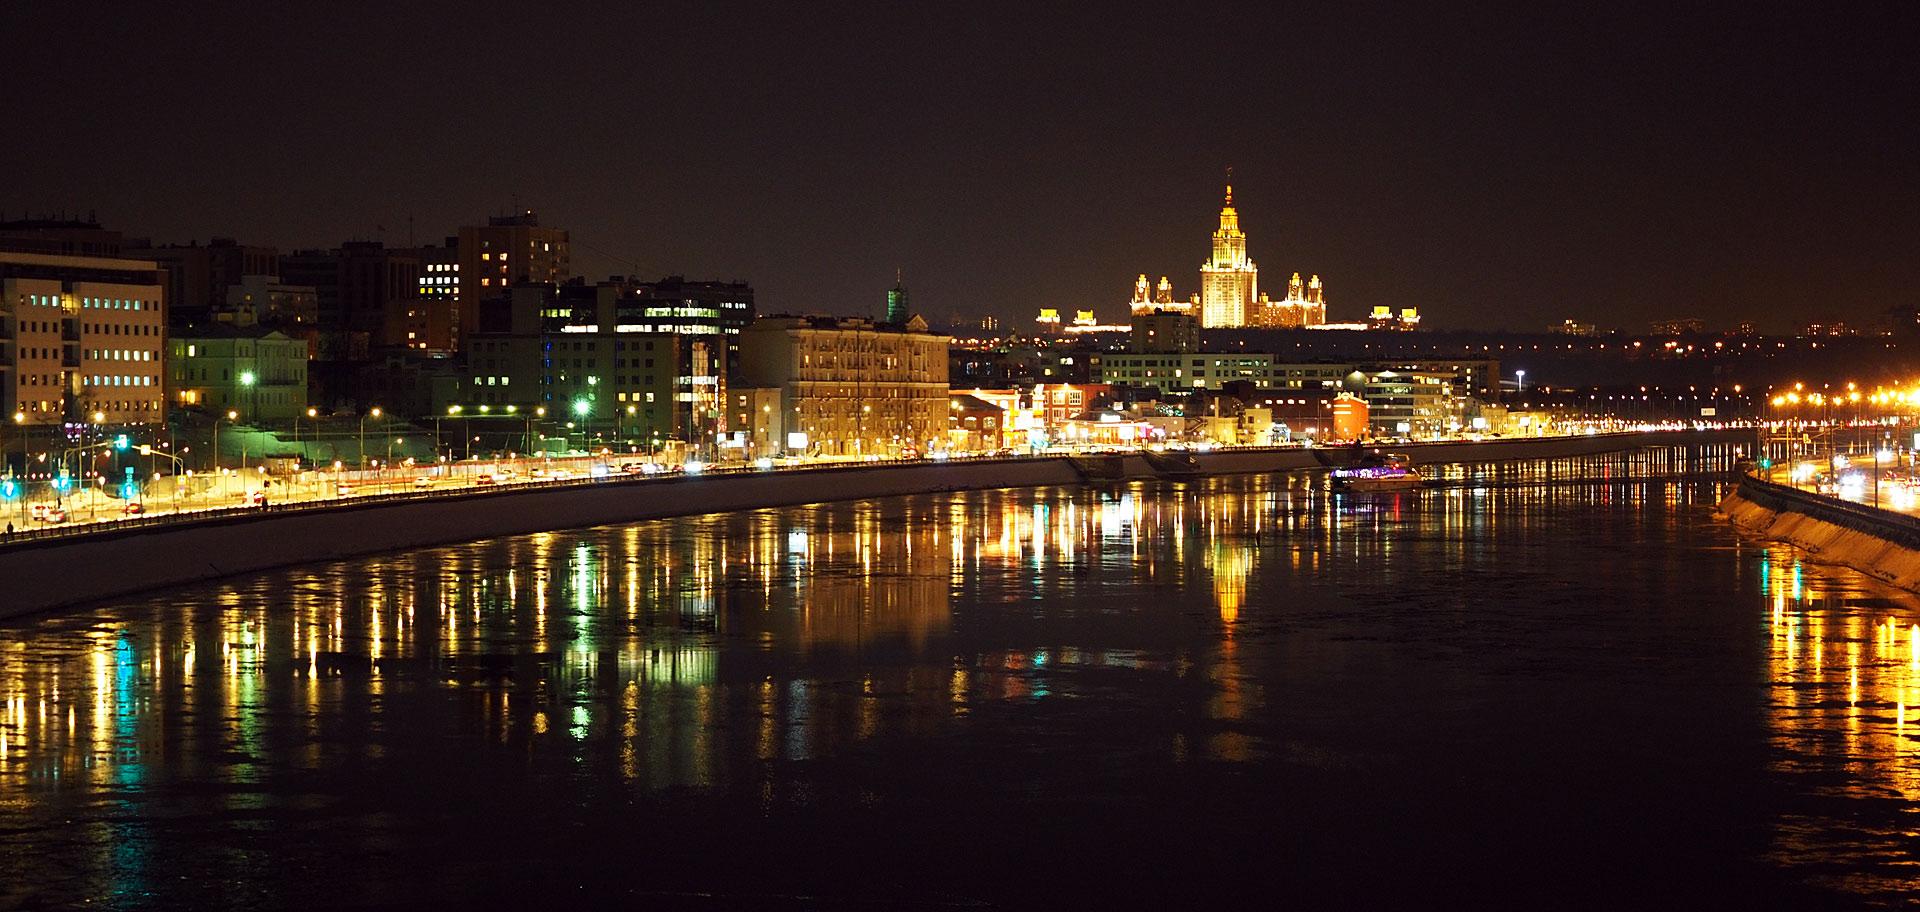 http://www.info-cam.ru/gallery/data/media/155/P2120468TGS.jpg